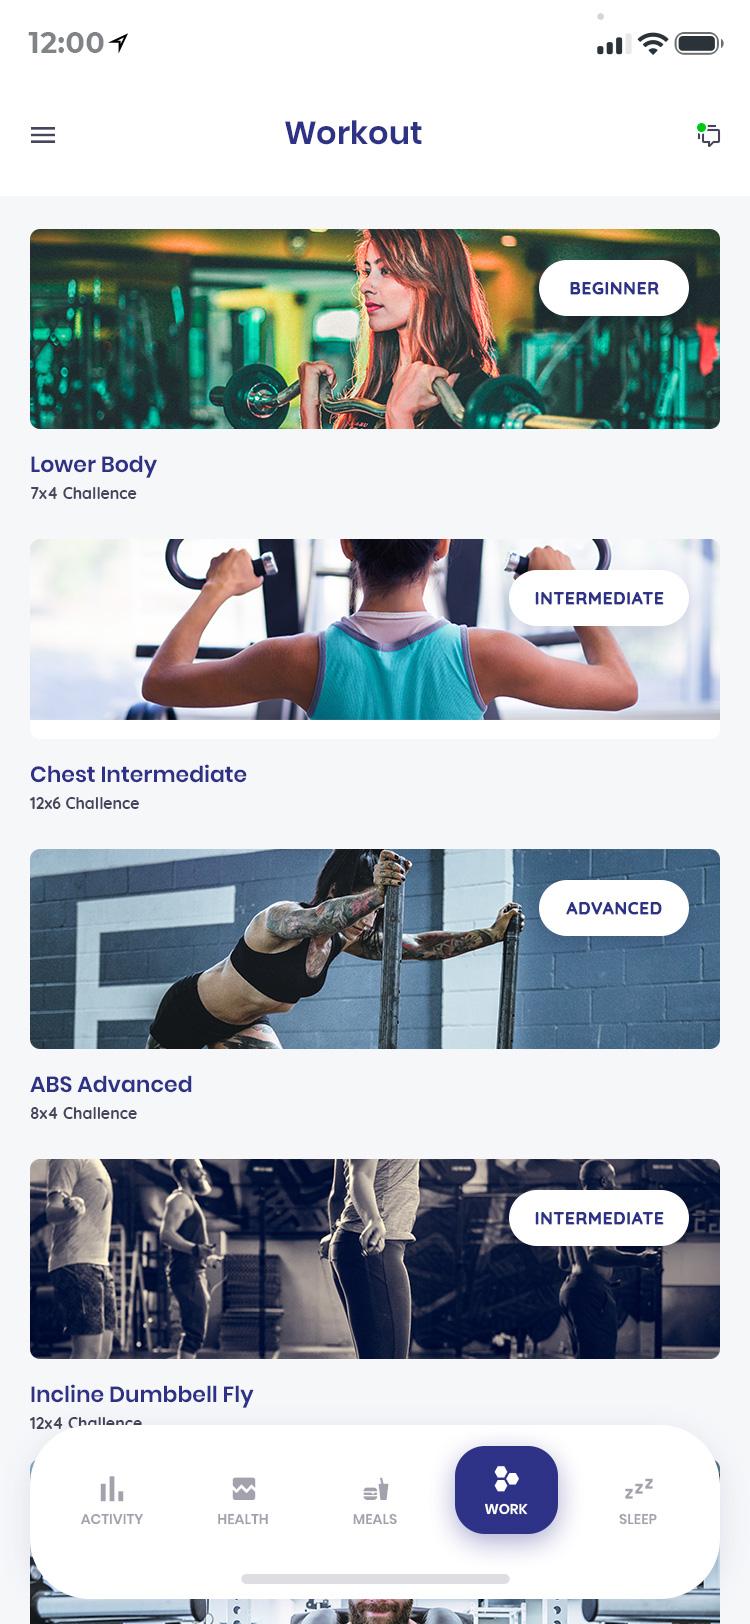 mobile-app-fitness-9